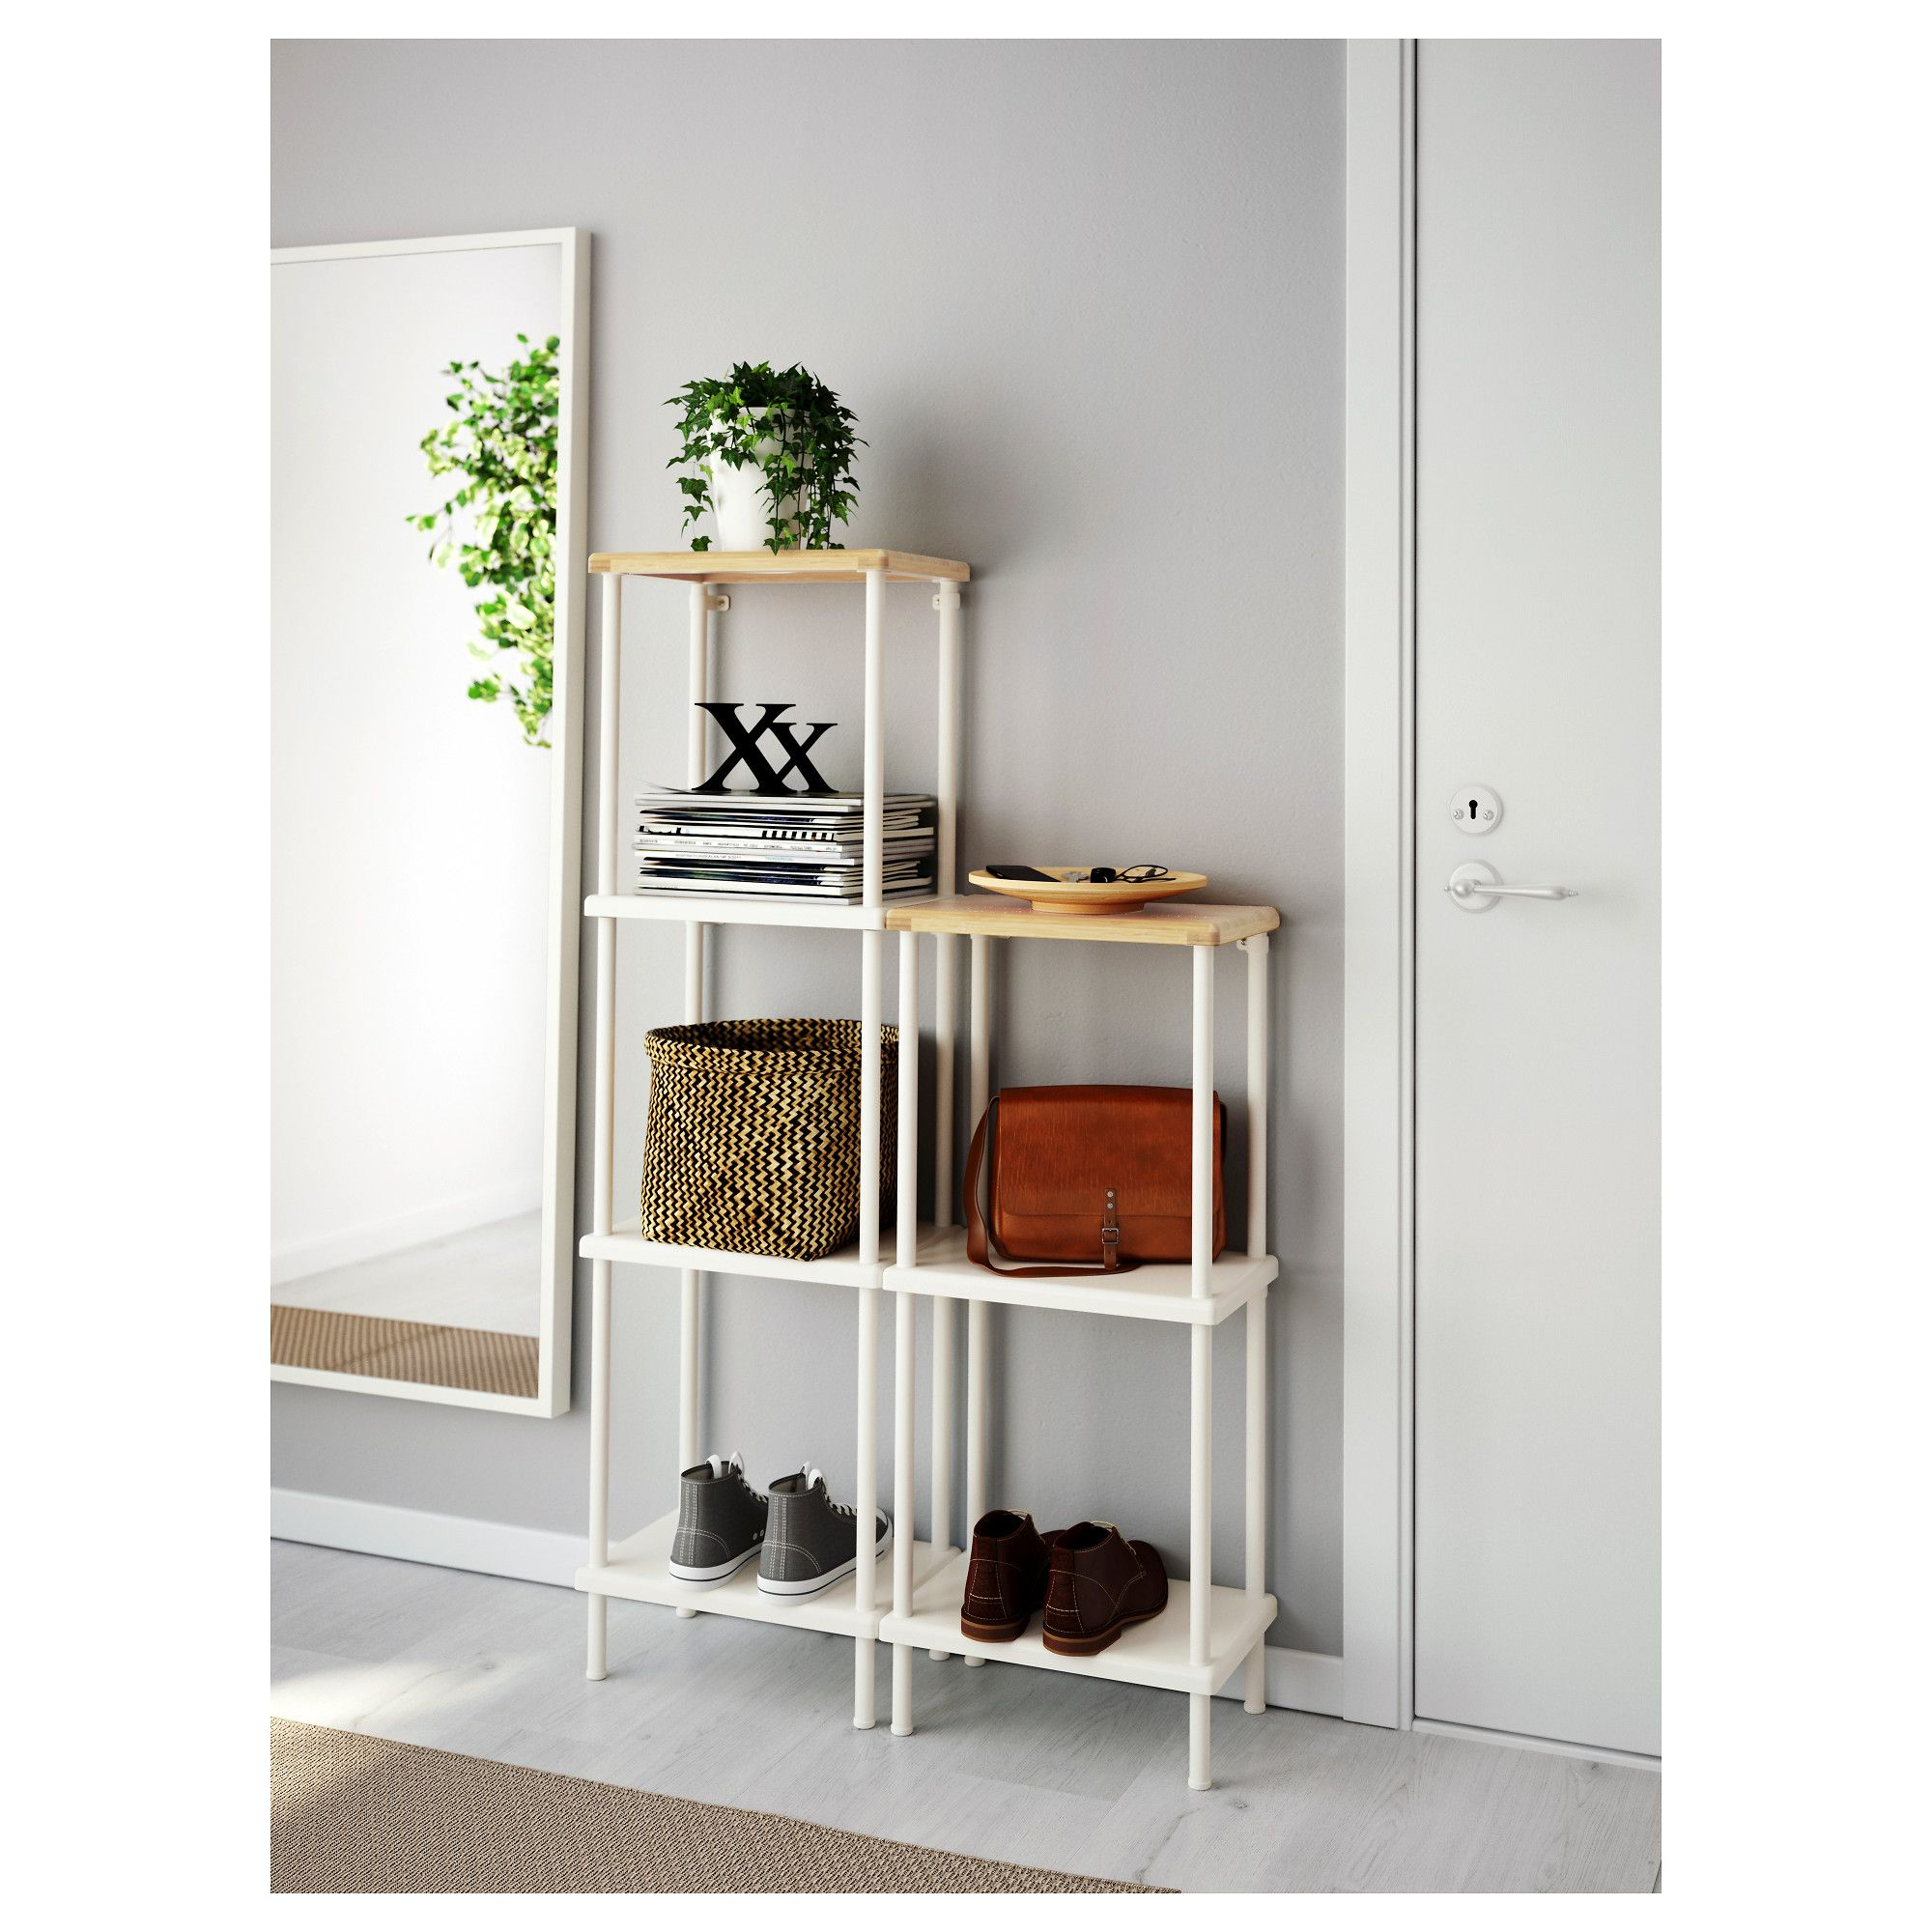 dynan shelf unit white bamboo pattern in 2019 products ikea rh pinterest com